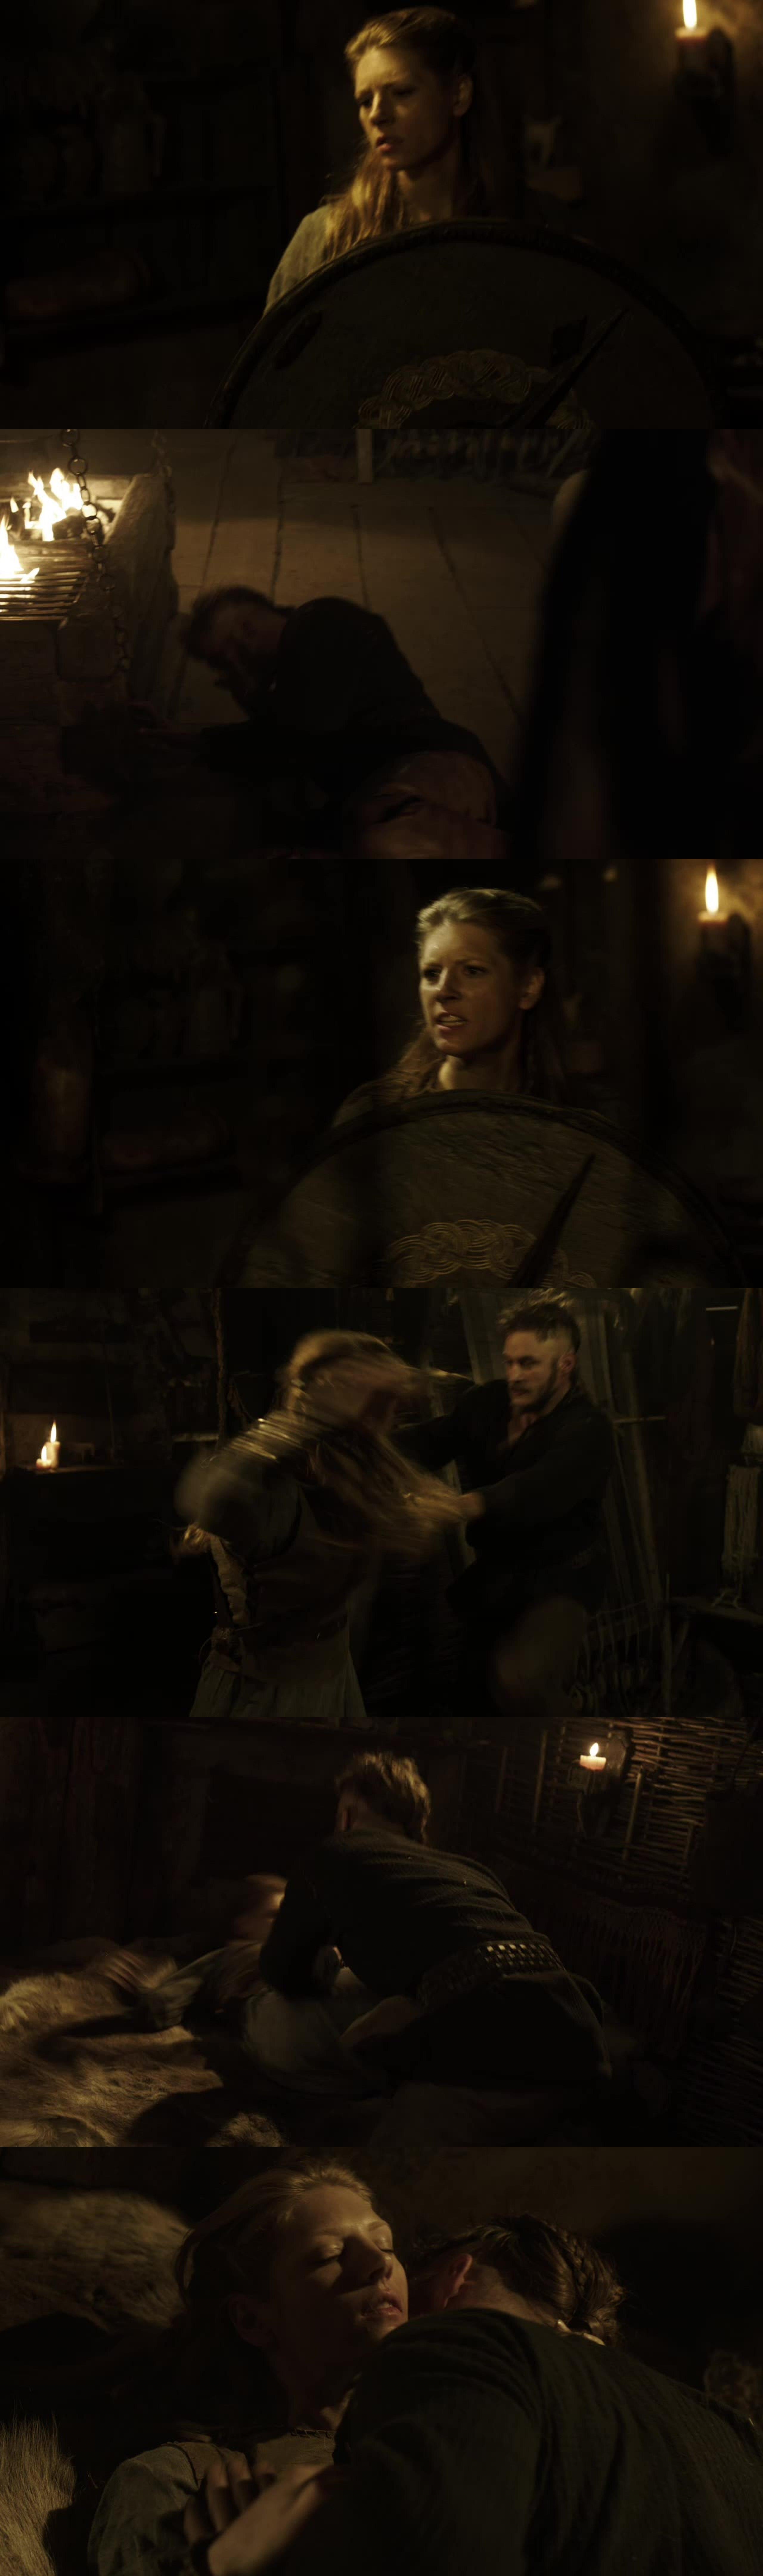 Lol viking's idea of foreplay